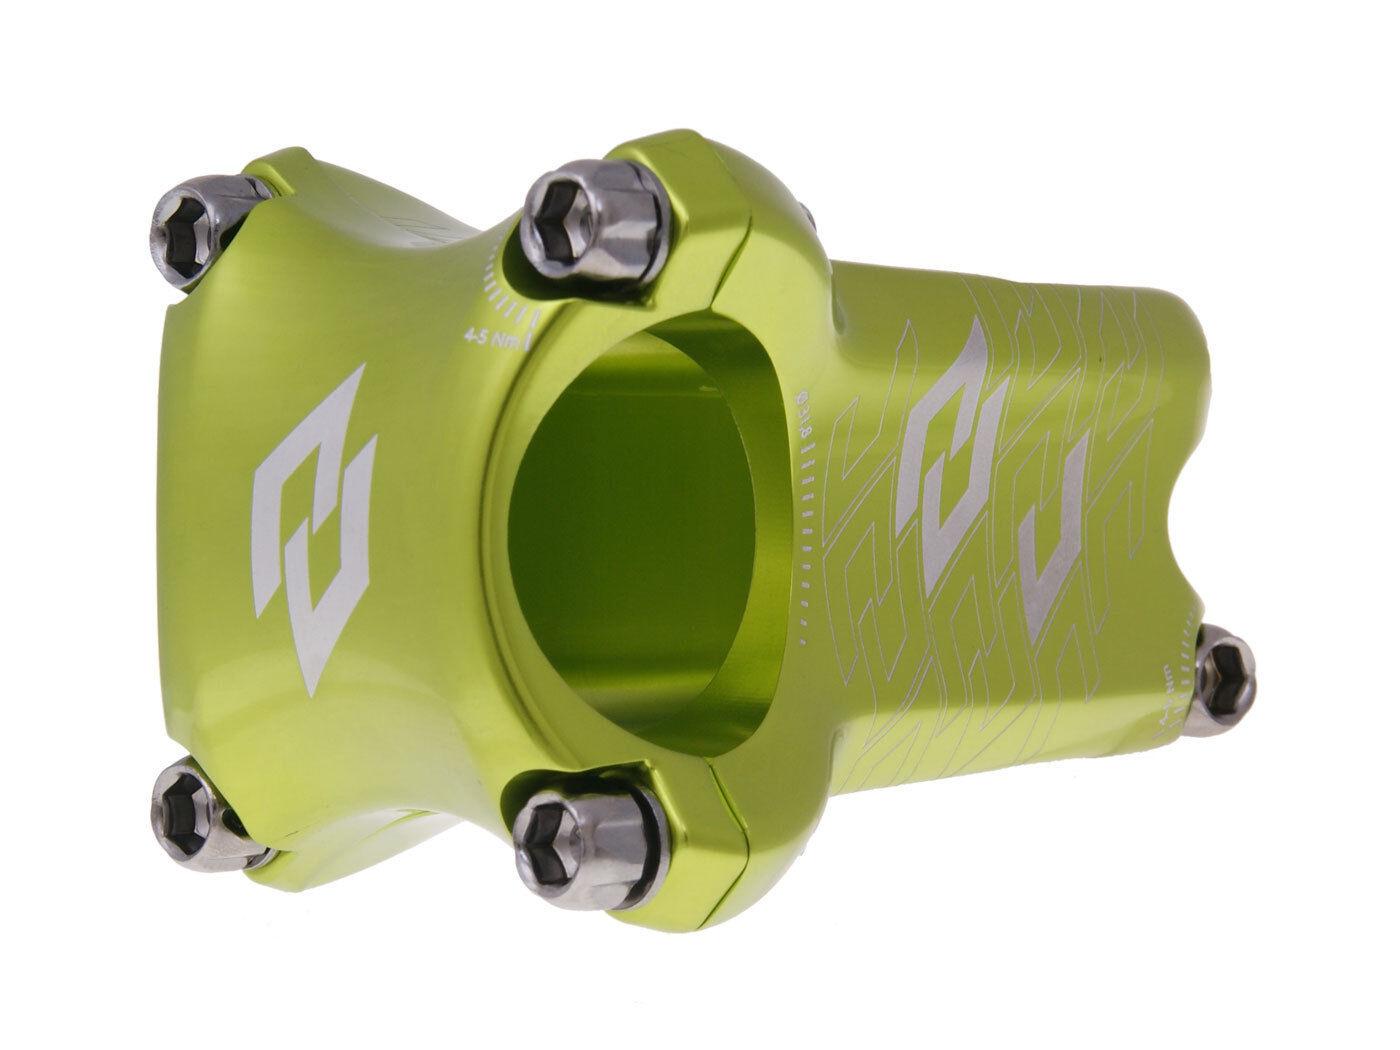 N8tive Enduro Enduro Enduro Stem Handlebar Recording Bicycle MTB Mountain Bike Downhill negro 5a3bc1